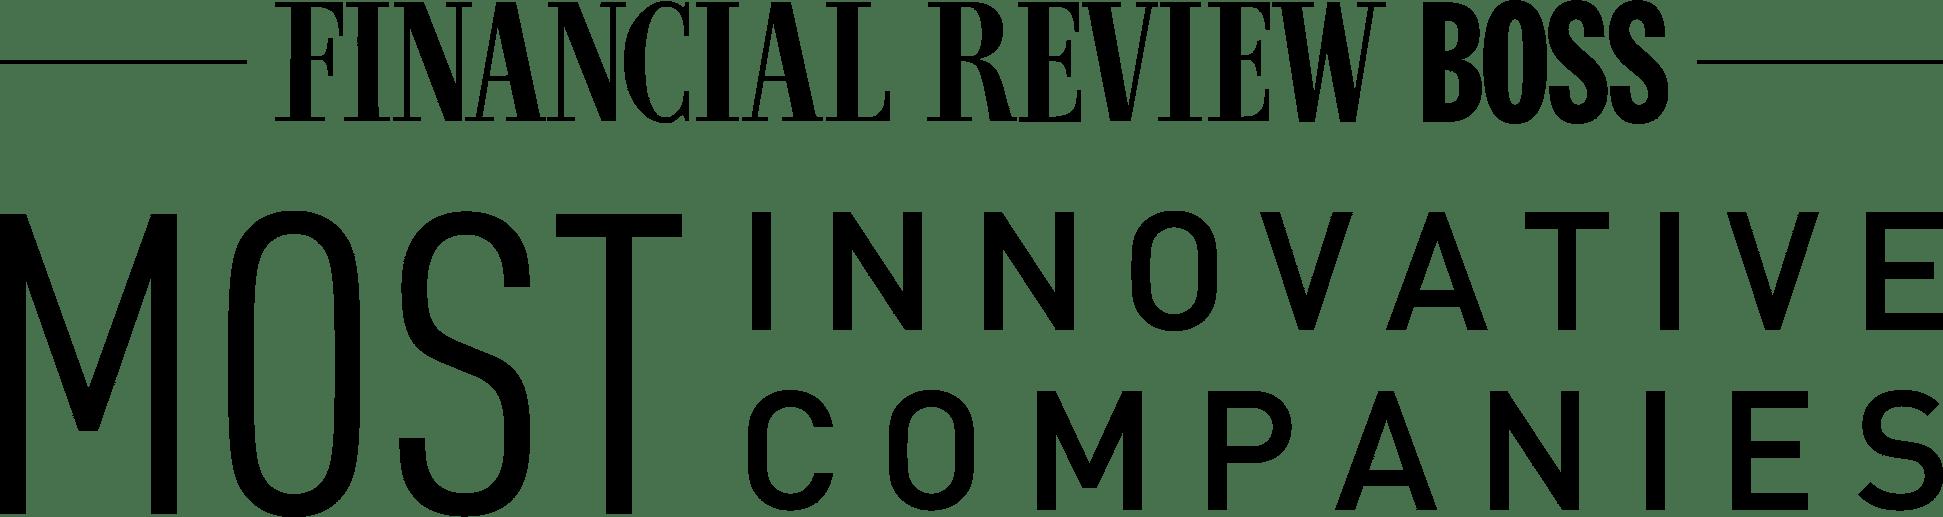 Financial Review Boss Most Innovative Companies logo